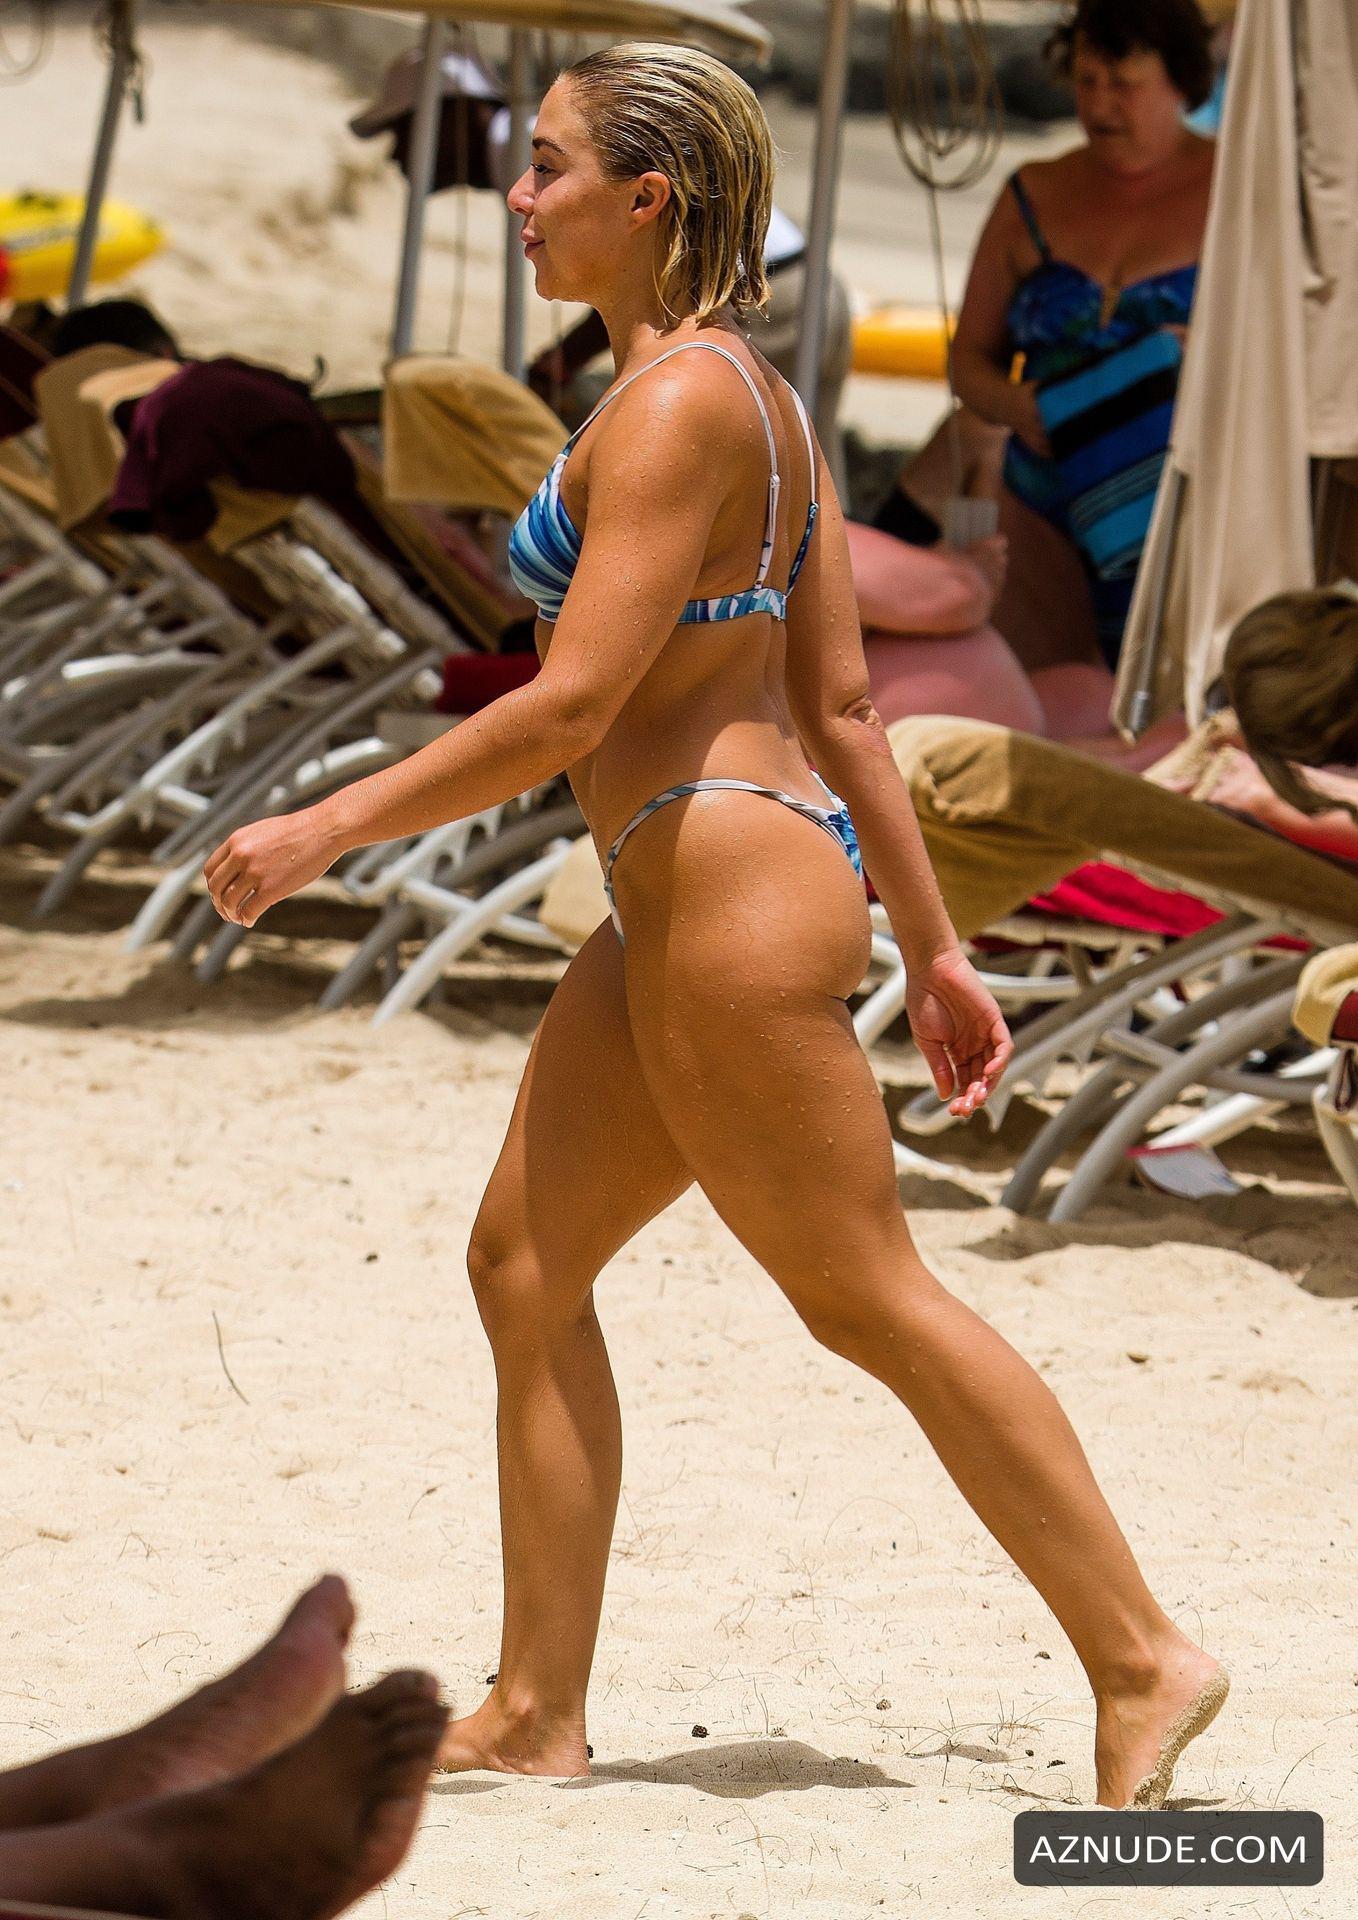 Carolina nackt Dias Kaka's Wife,